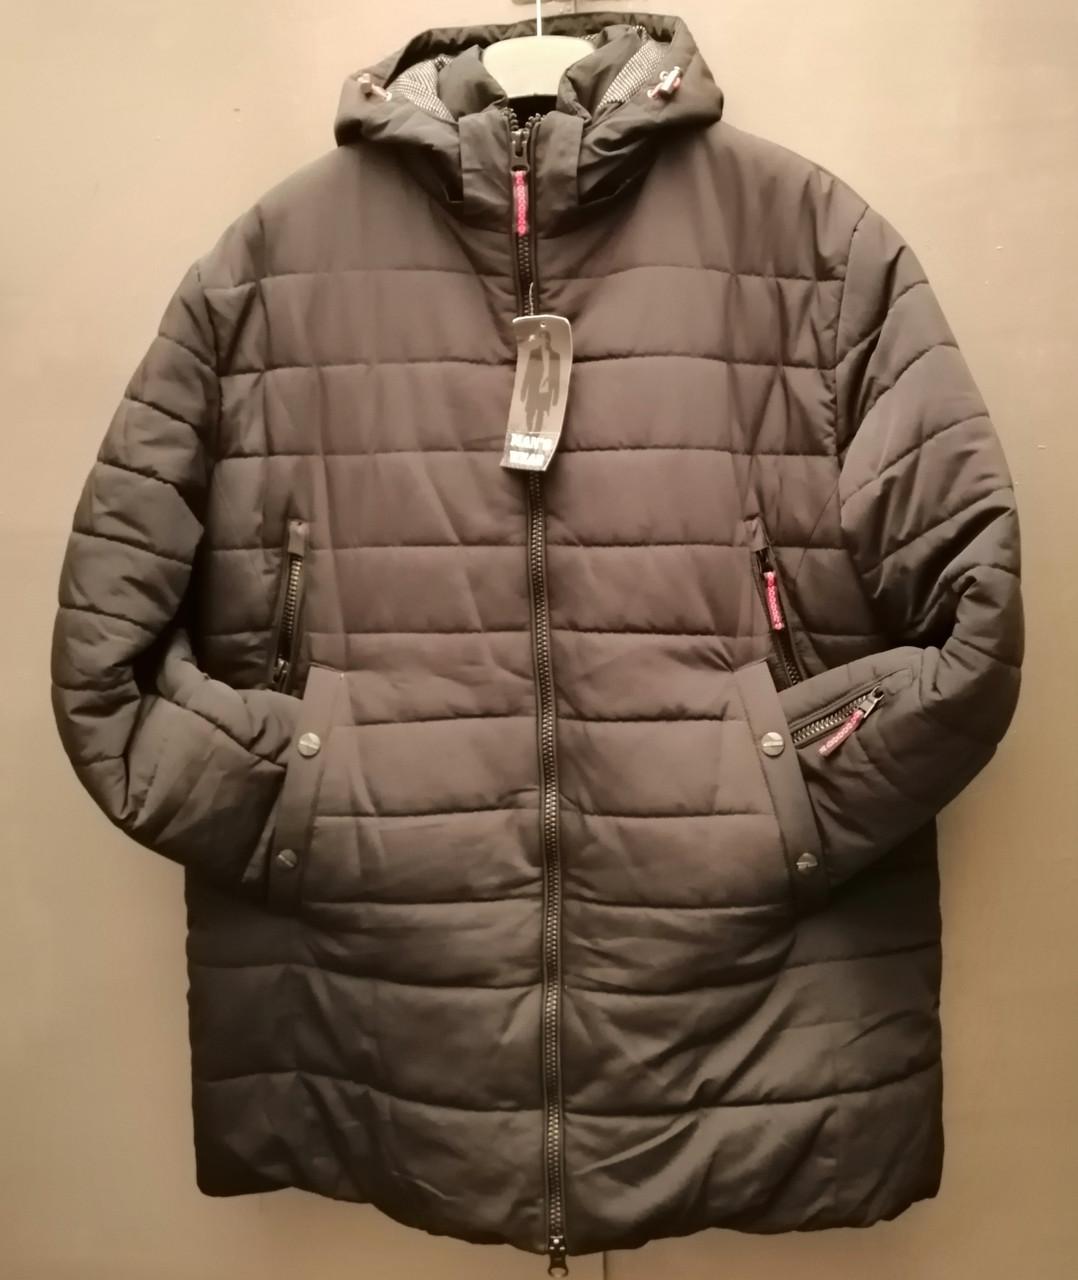 Куртка удлинённая 56р. Мужская, зимняя